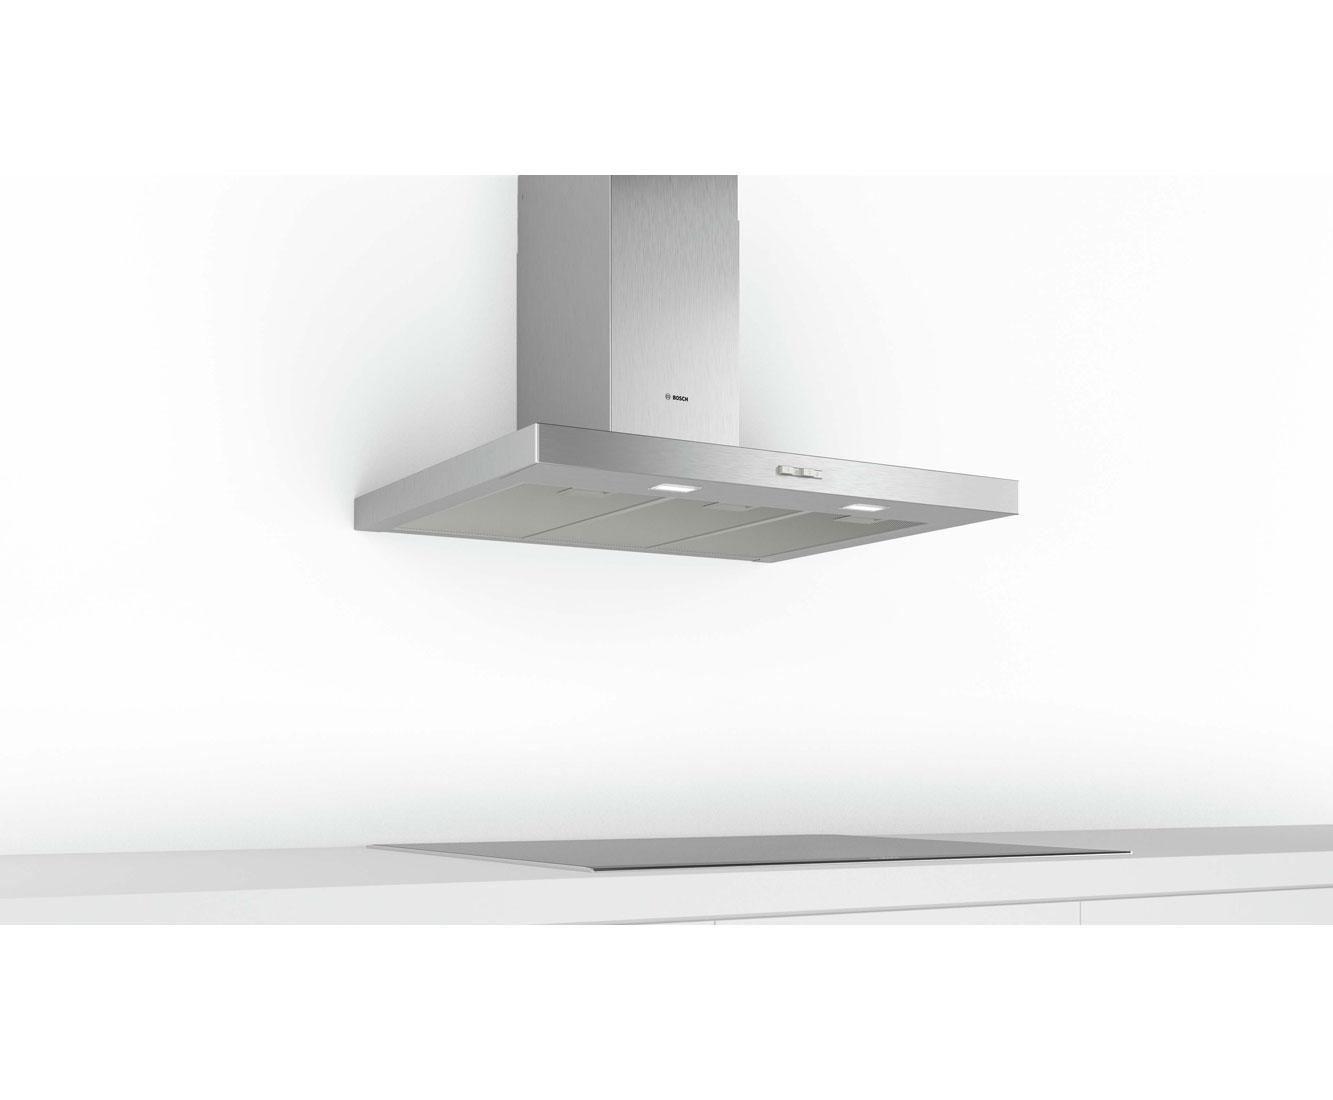 Bosch Dunstabzugshaube 90 Cm 2021